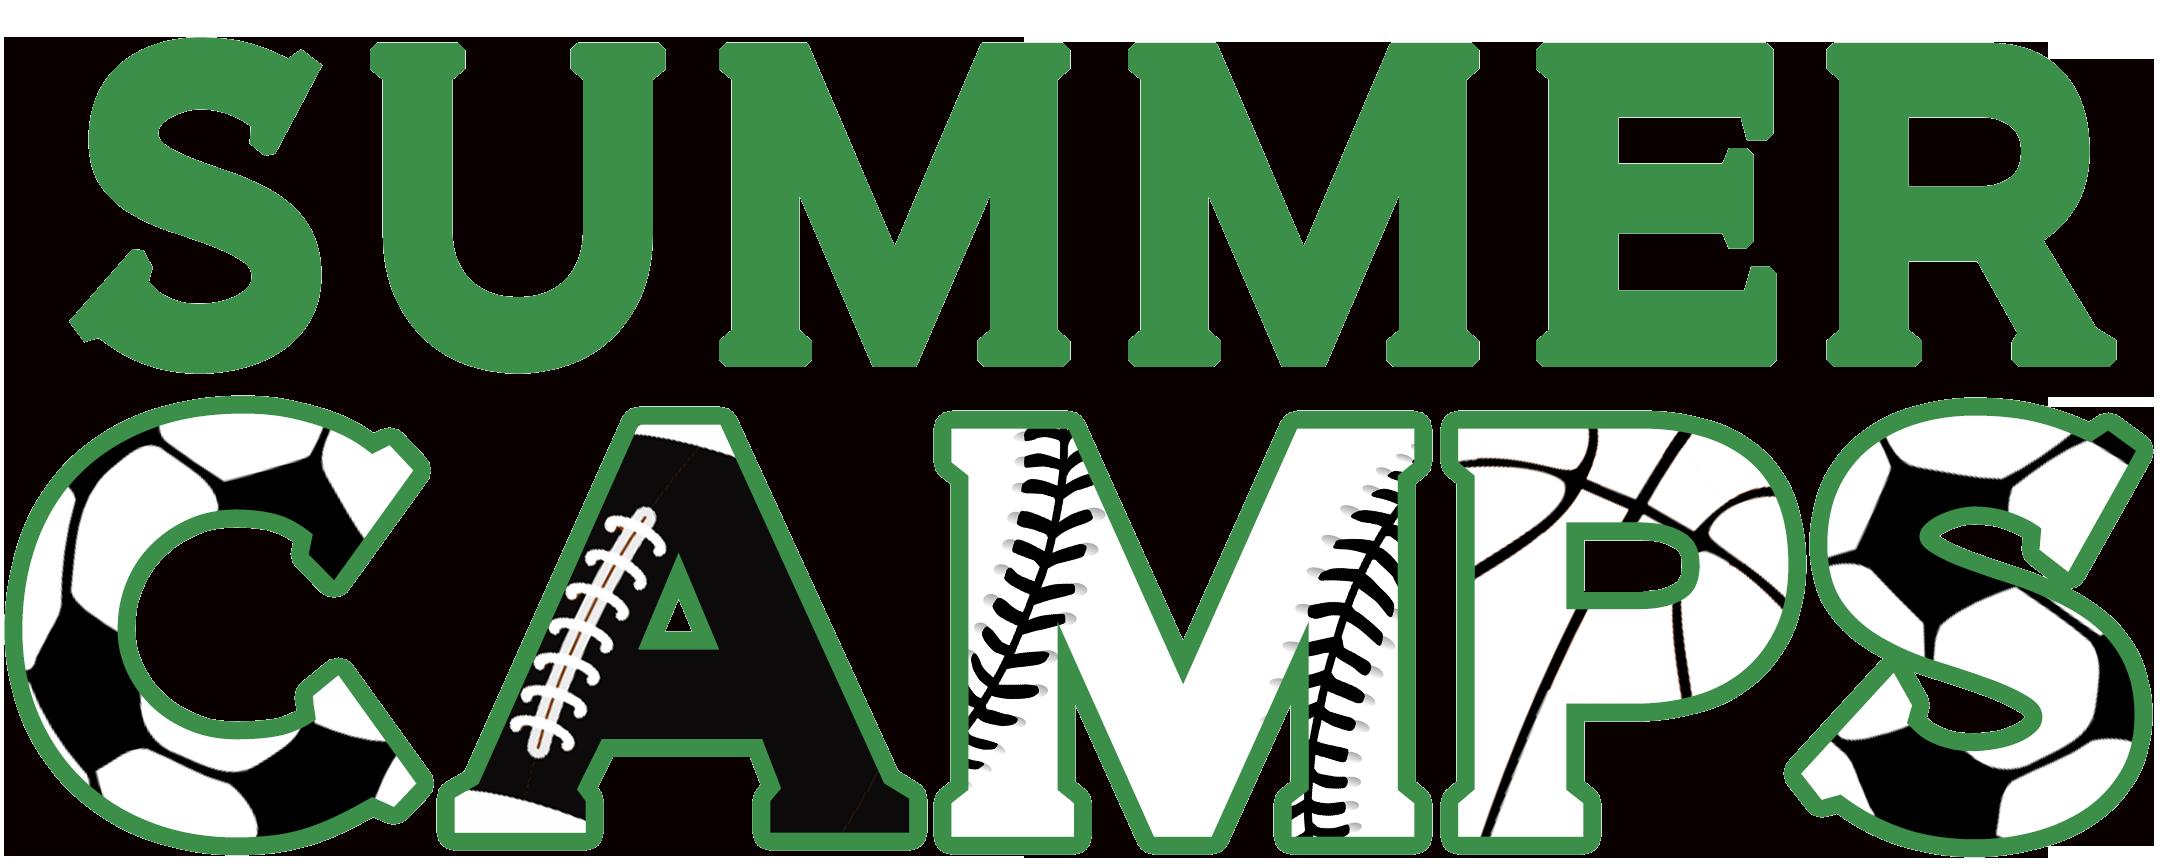 Summer-Sports-Camps-2019-07-30-18-25-14-UTC